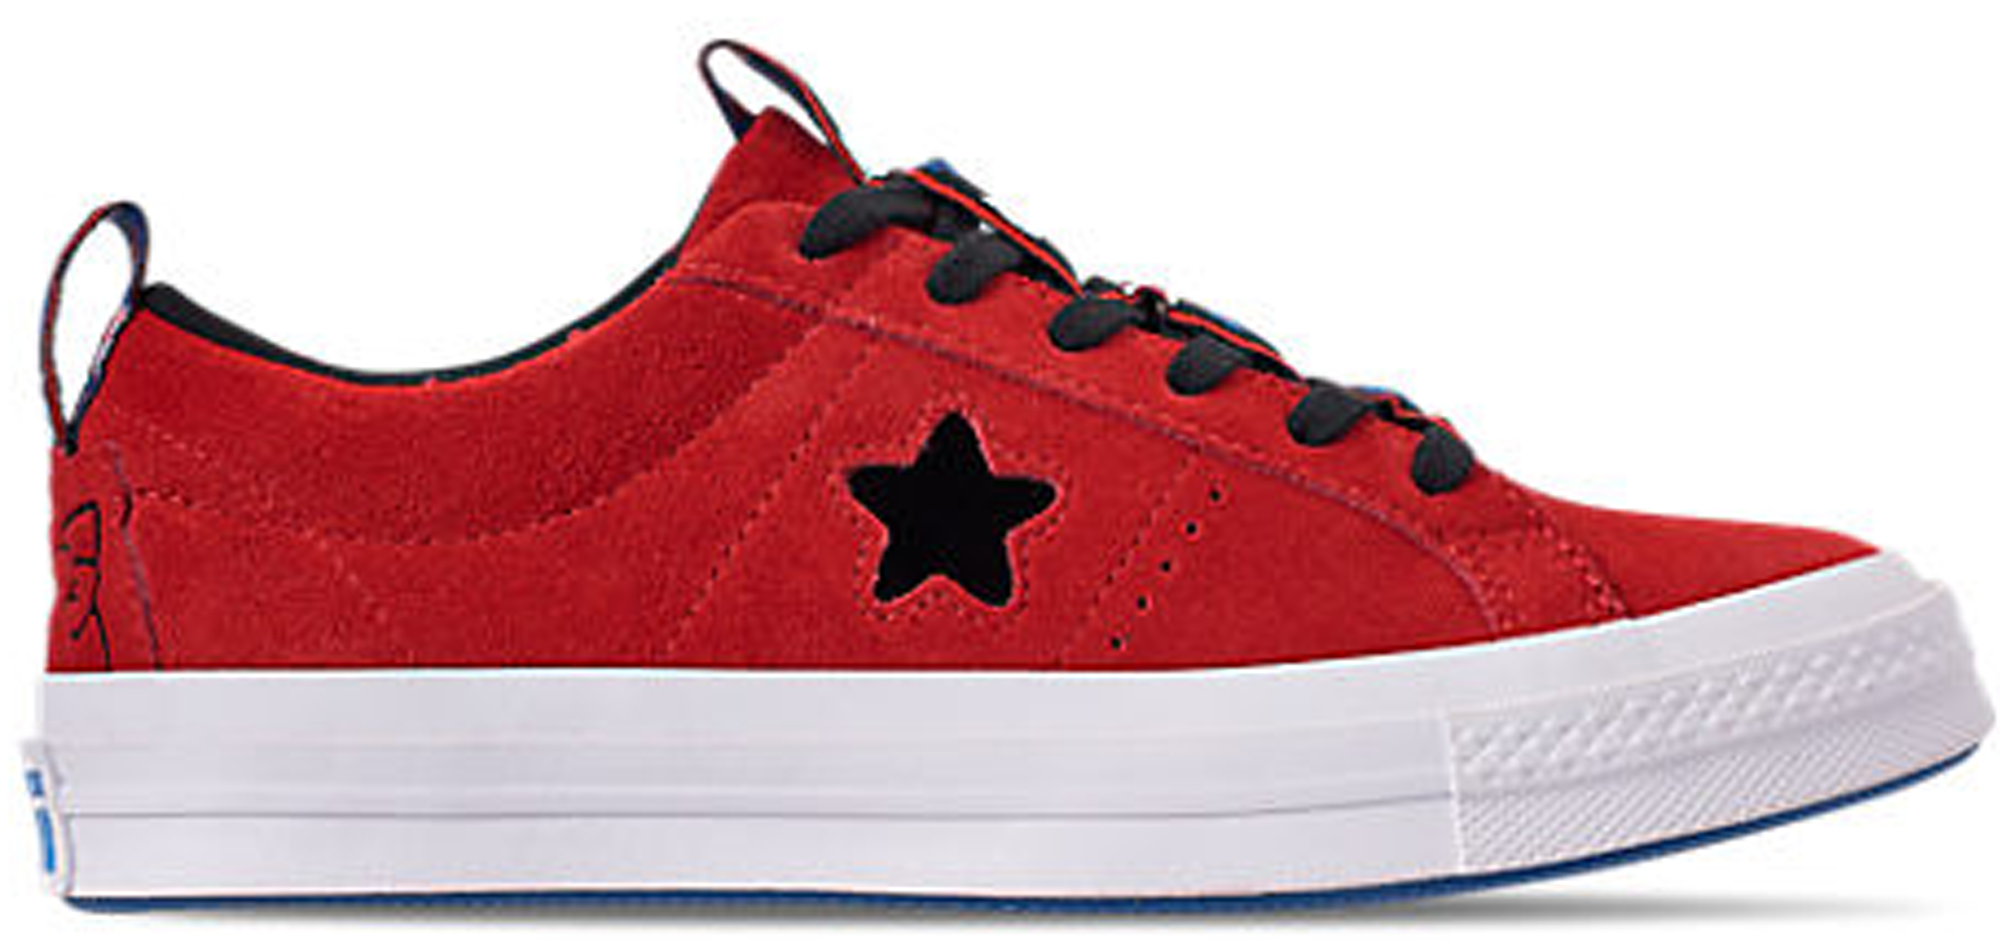 Converse One Star Ox Hello Kitty Fiery